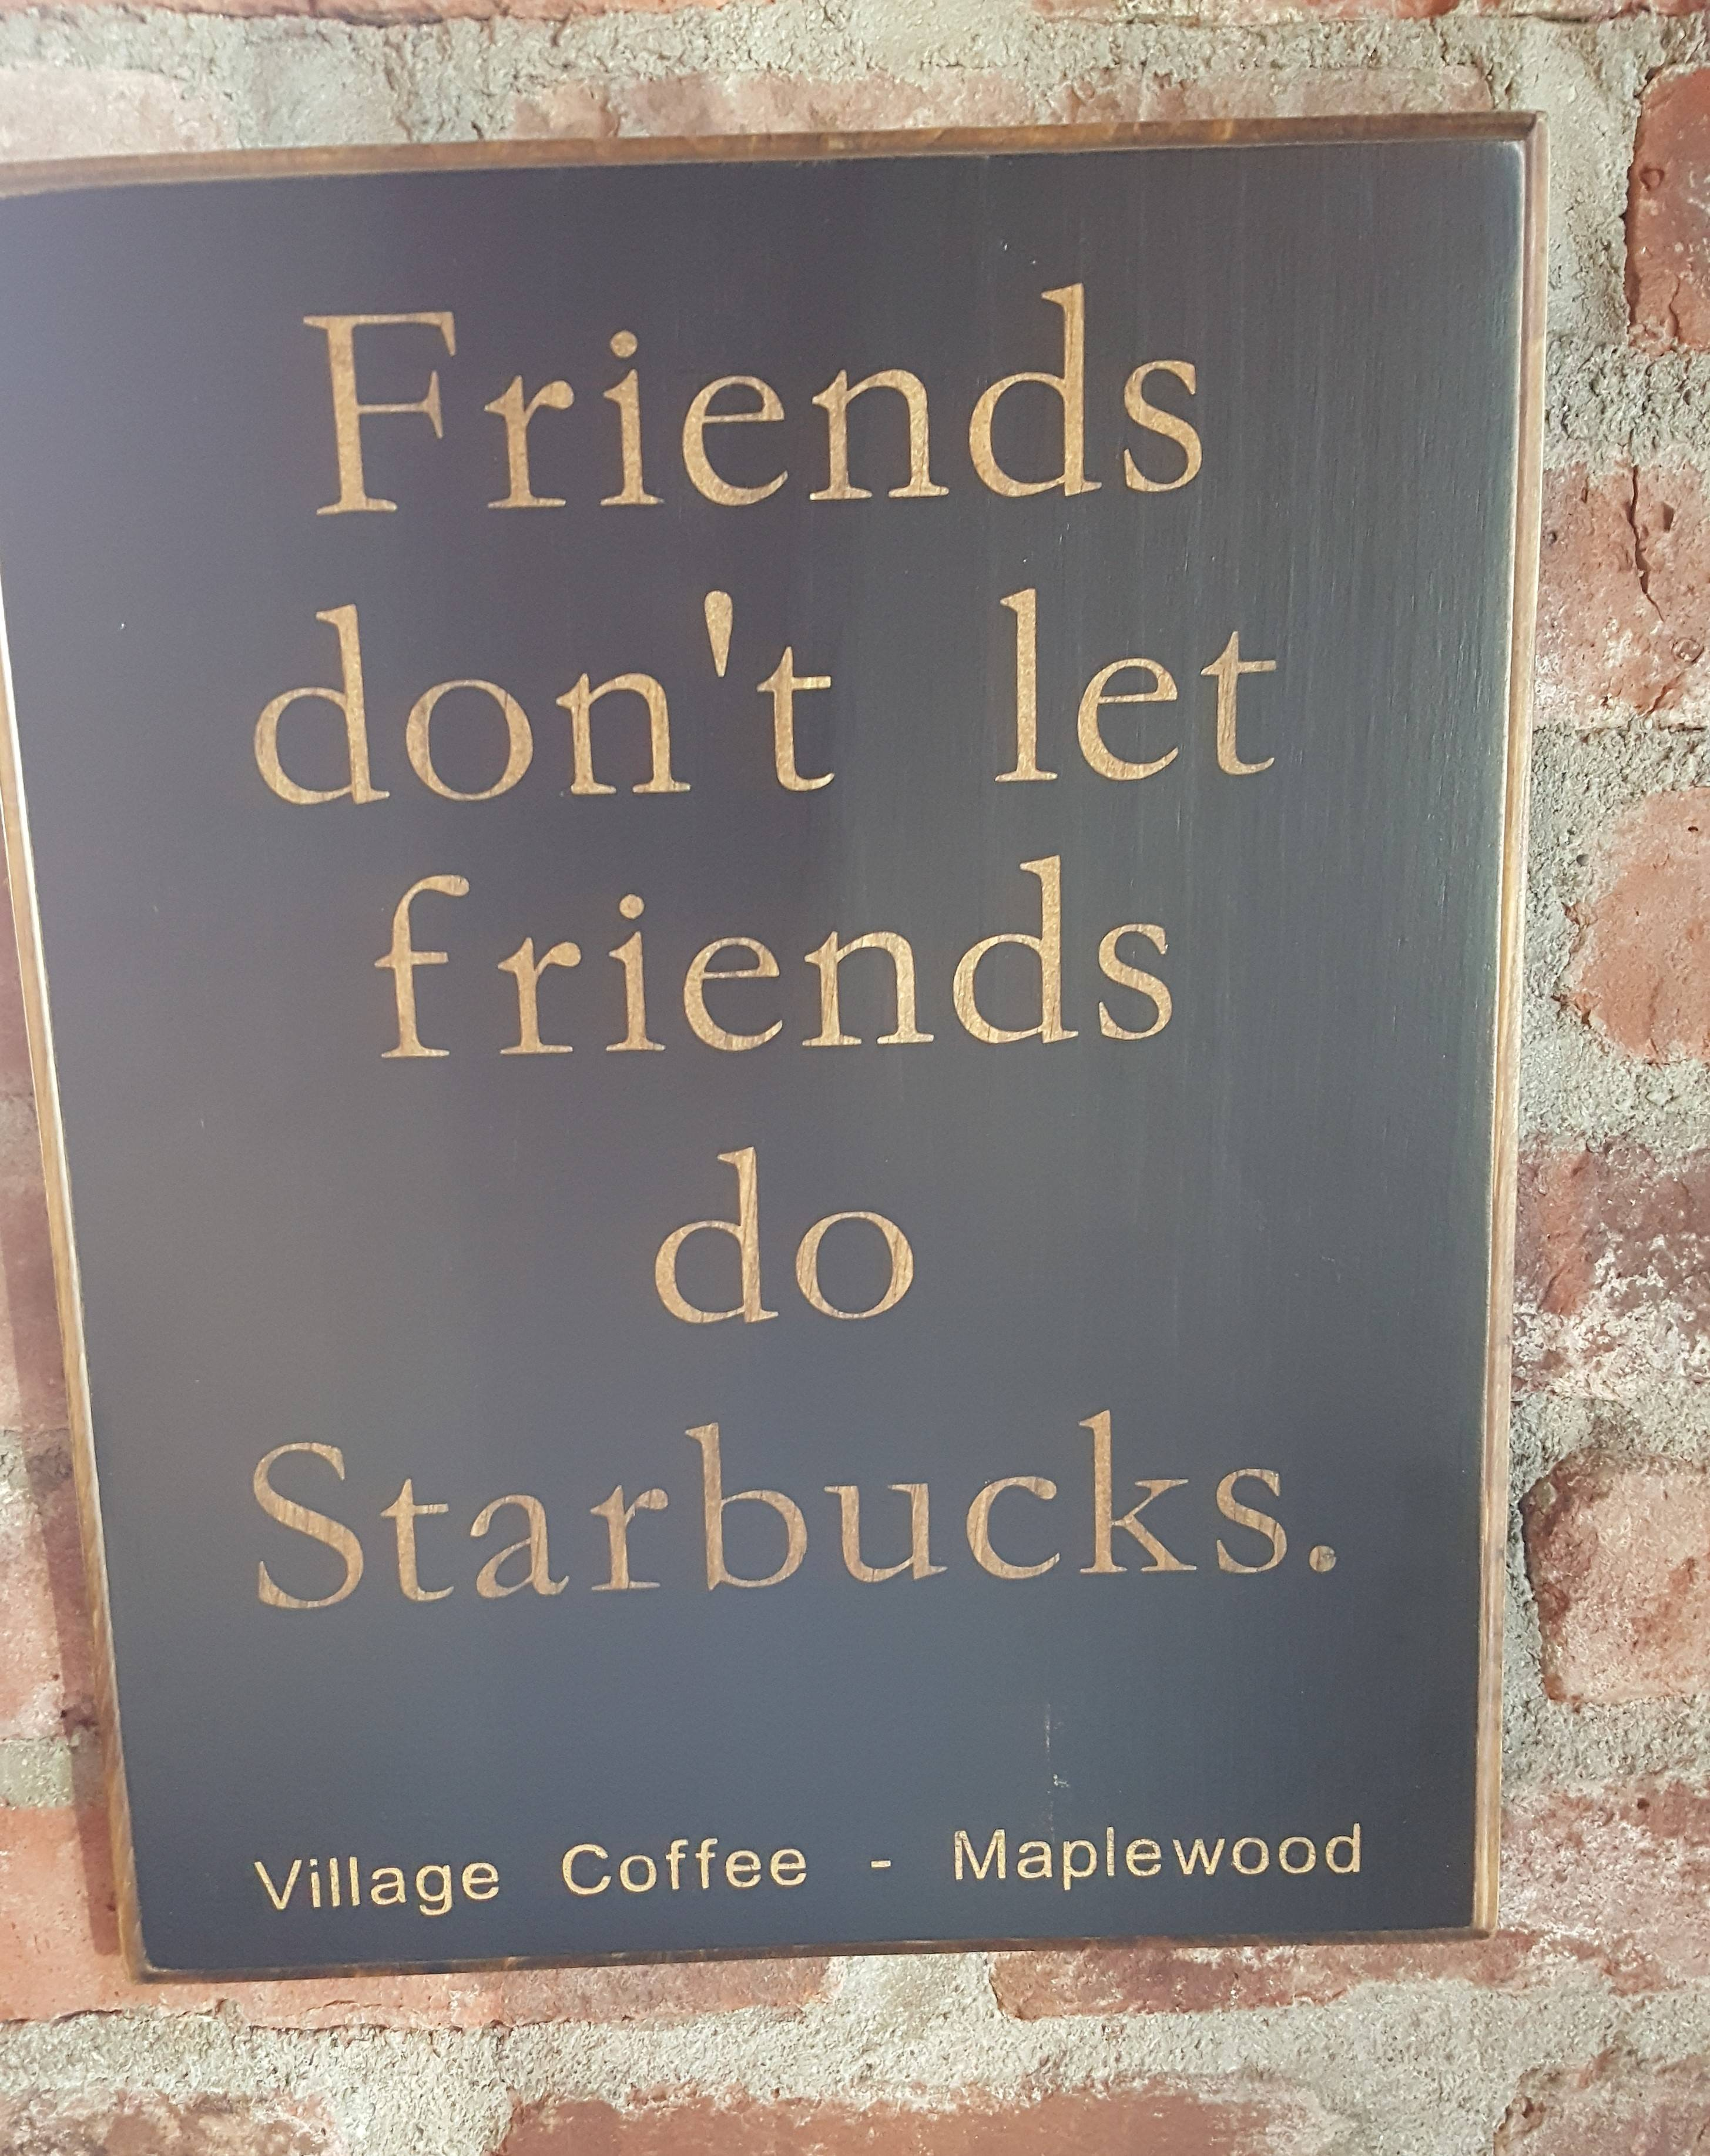 f1471740215dcd540160_starbucks_sign_village_coffee.jpg